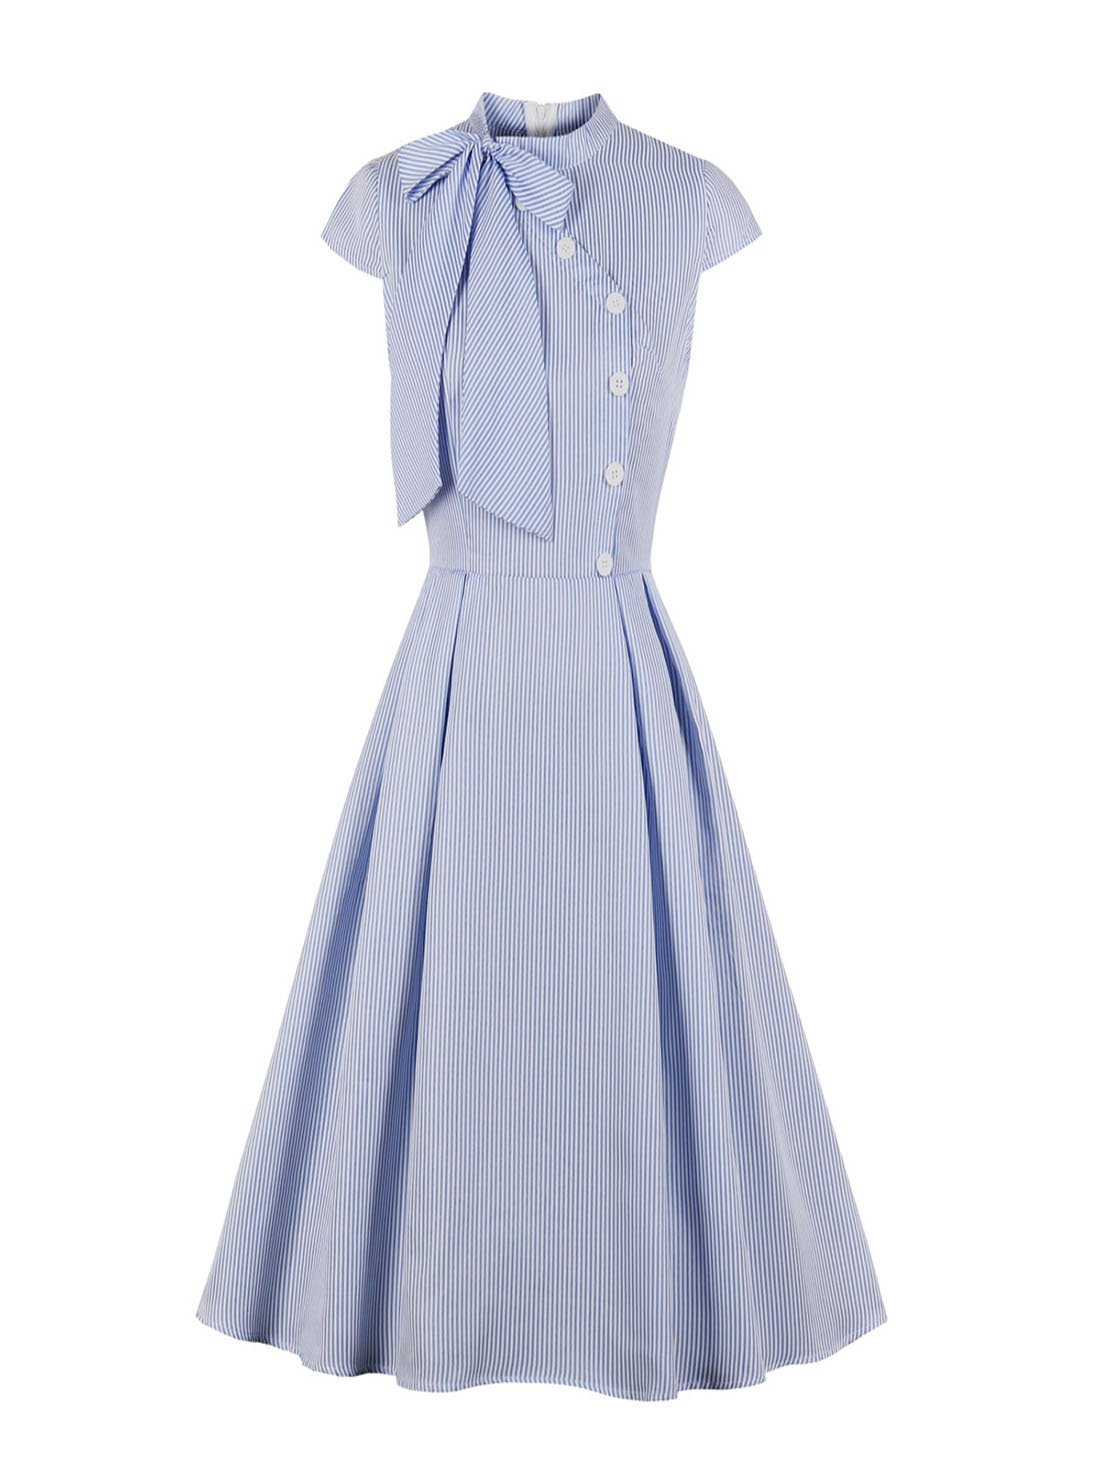 Plus-Size Women's Garments